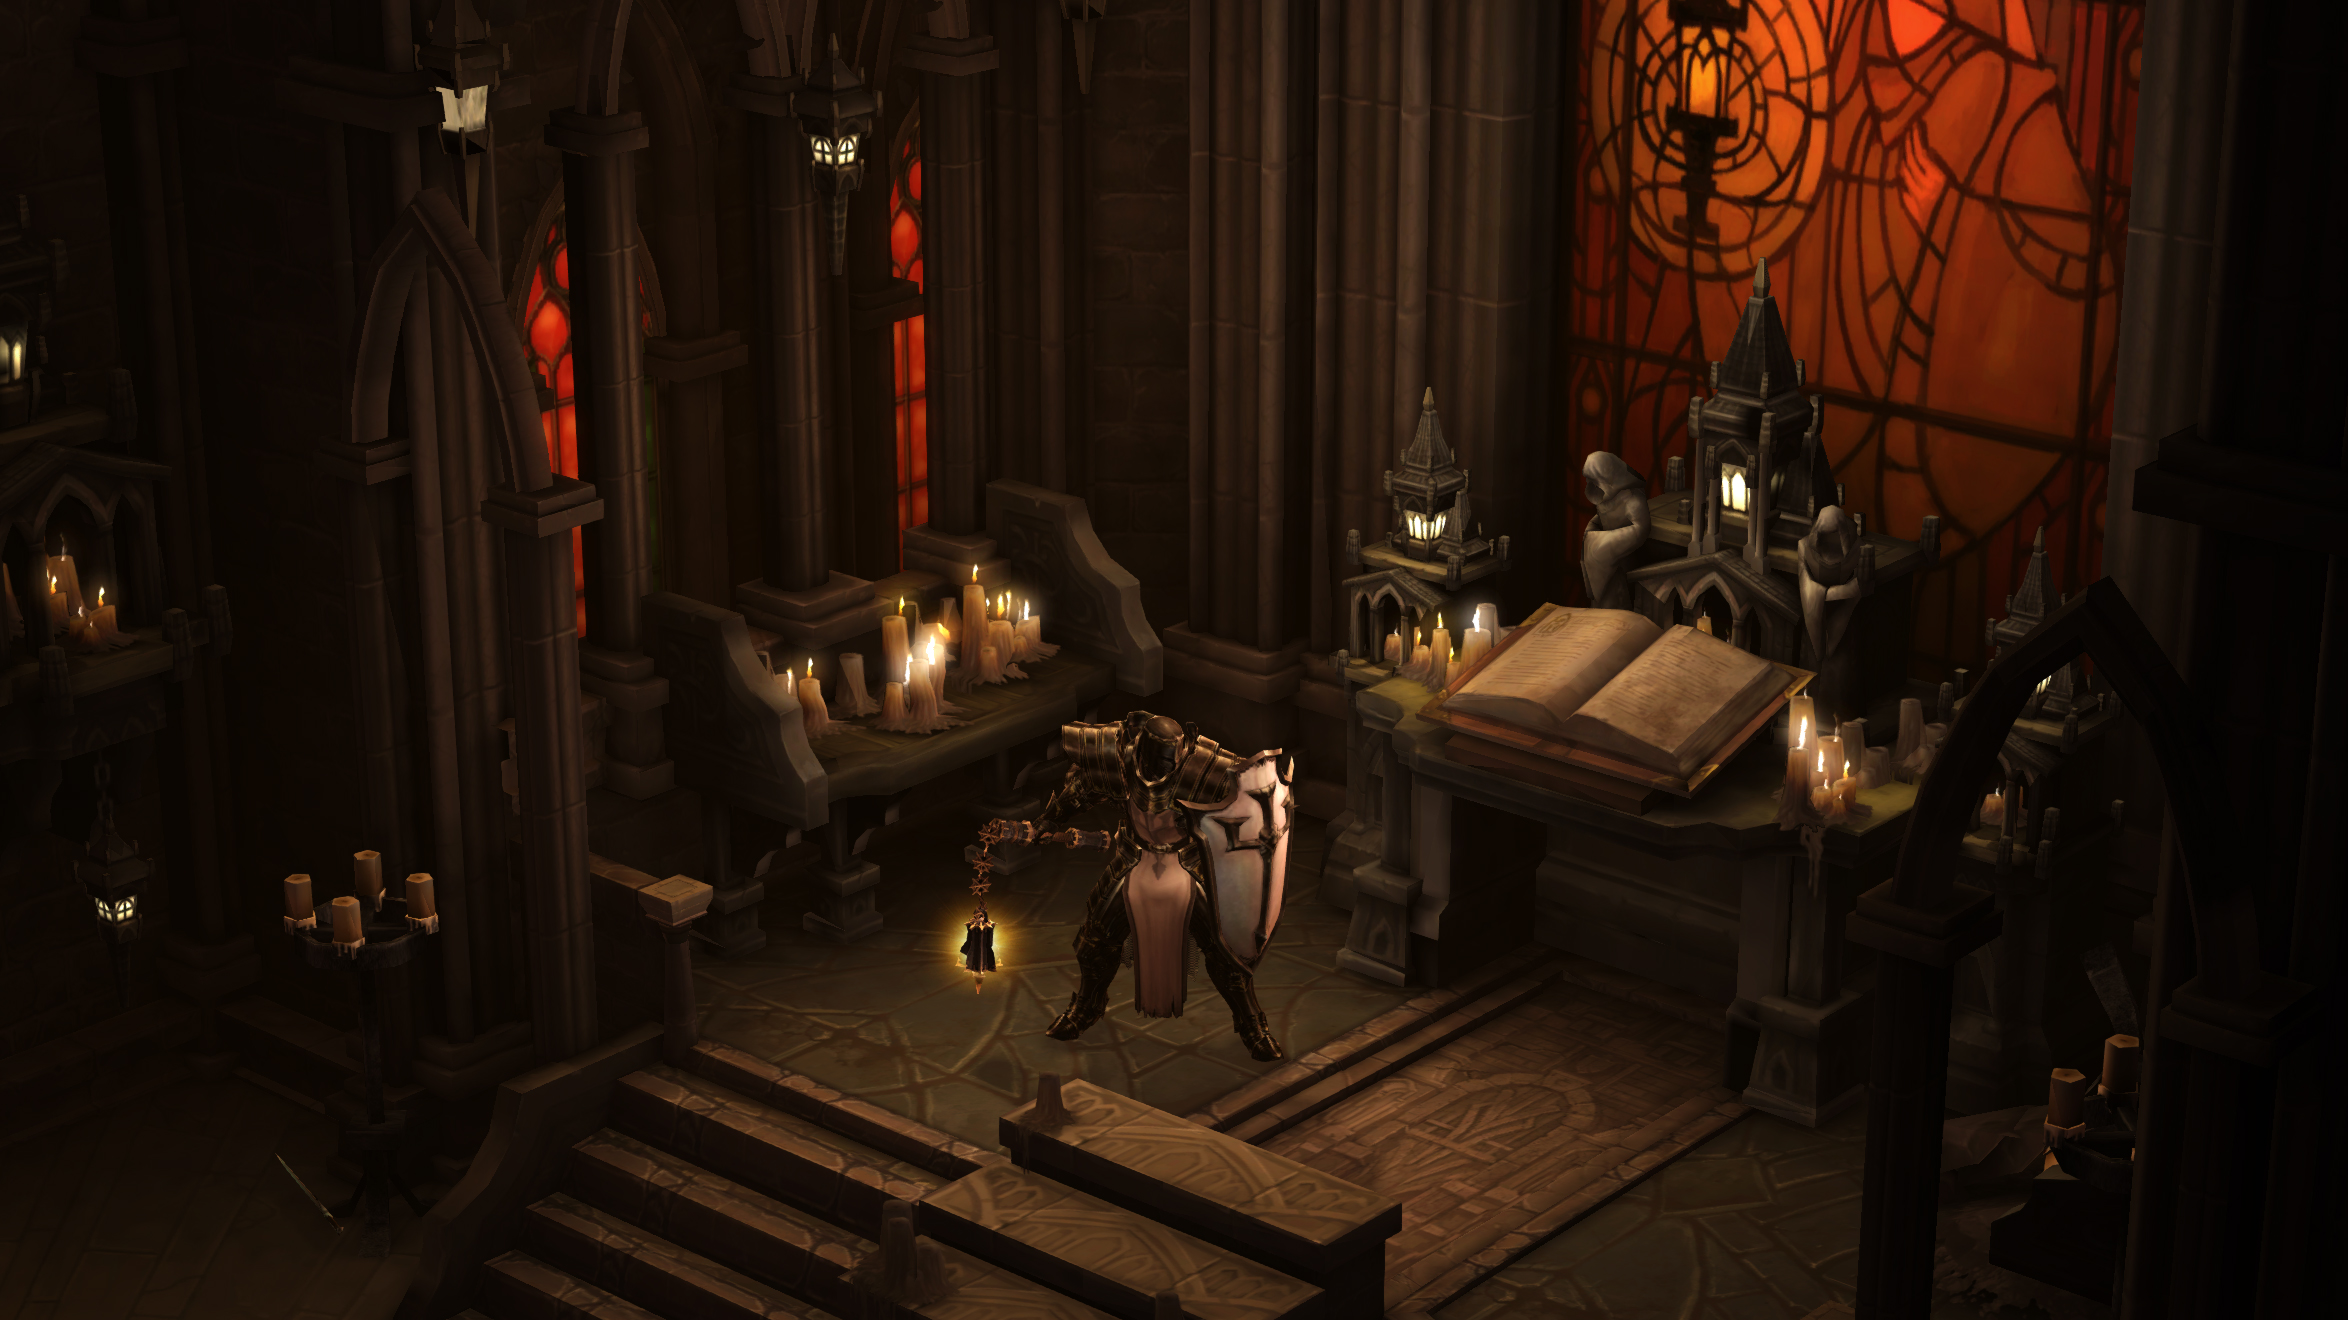 Reaper of souls nouvelle extension de Diablo III 980587822